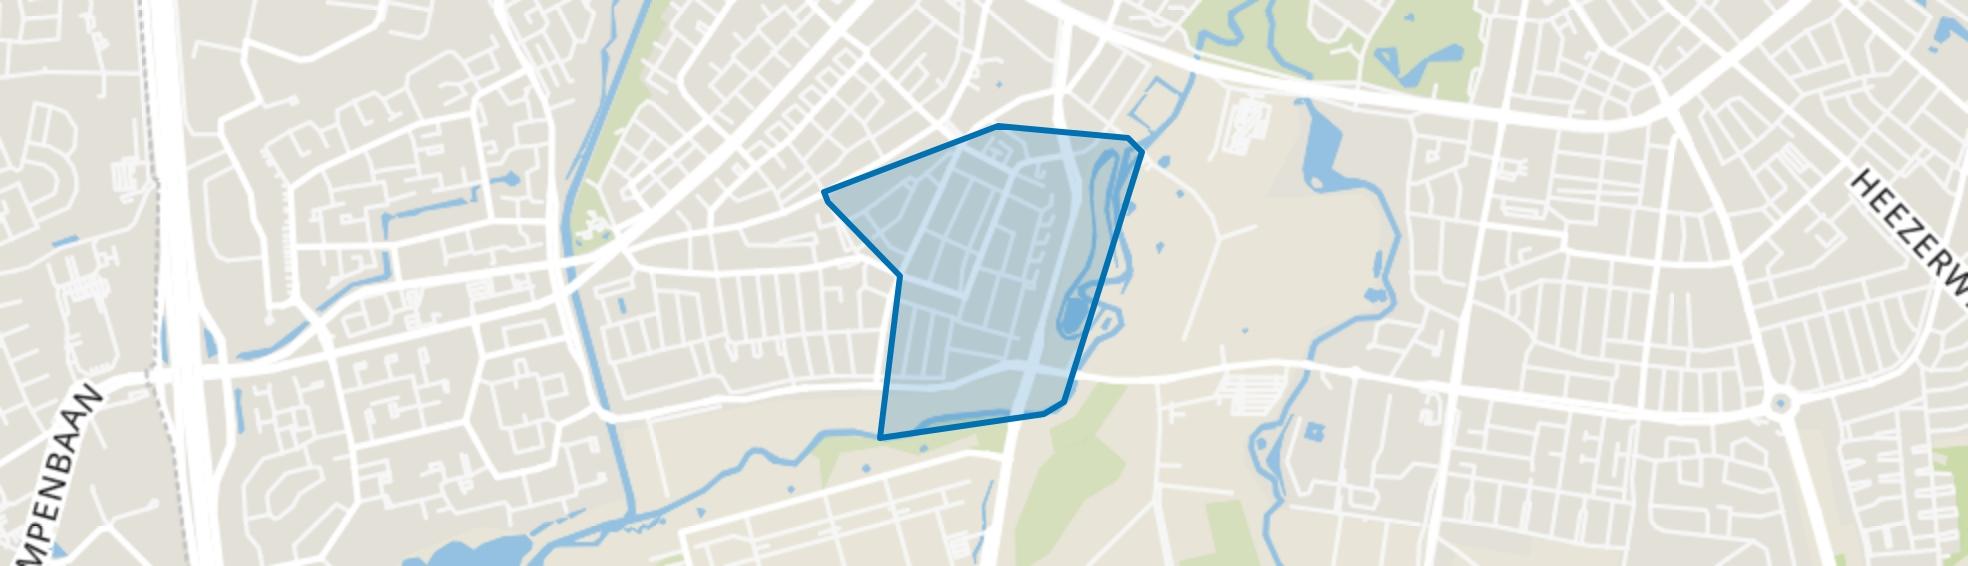 Bennekel-Oost, Eindhoven map